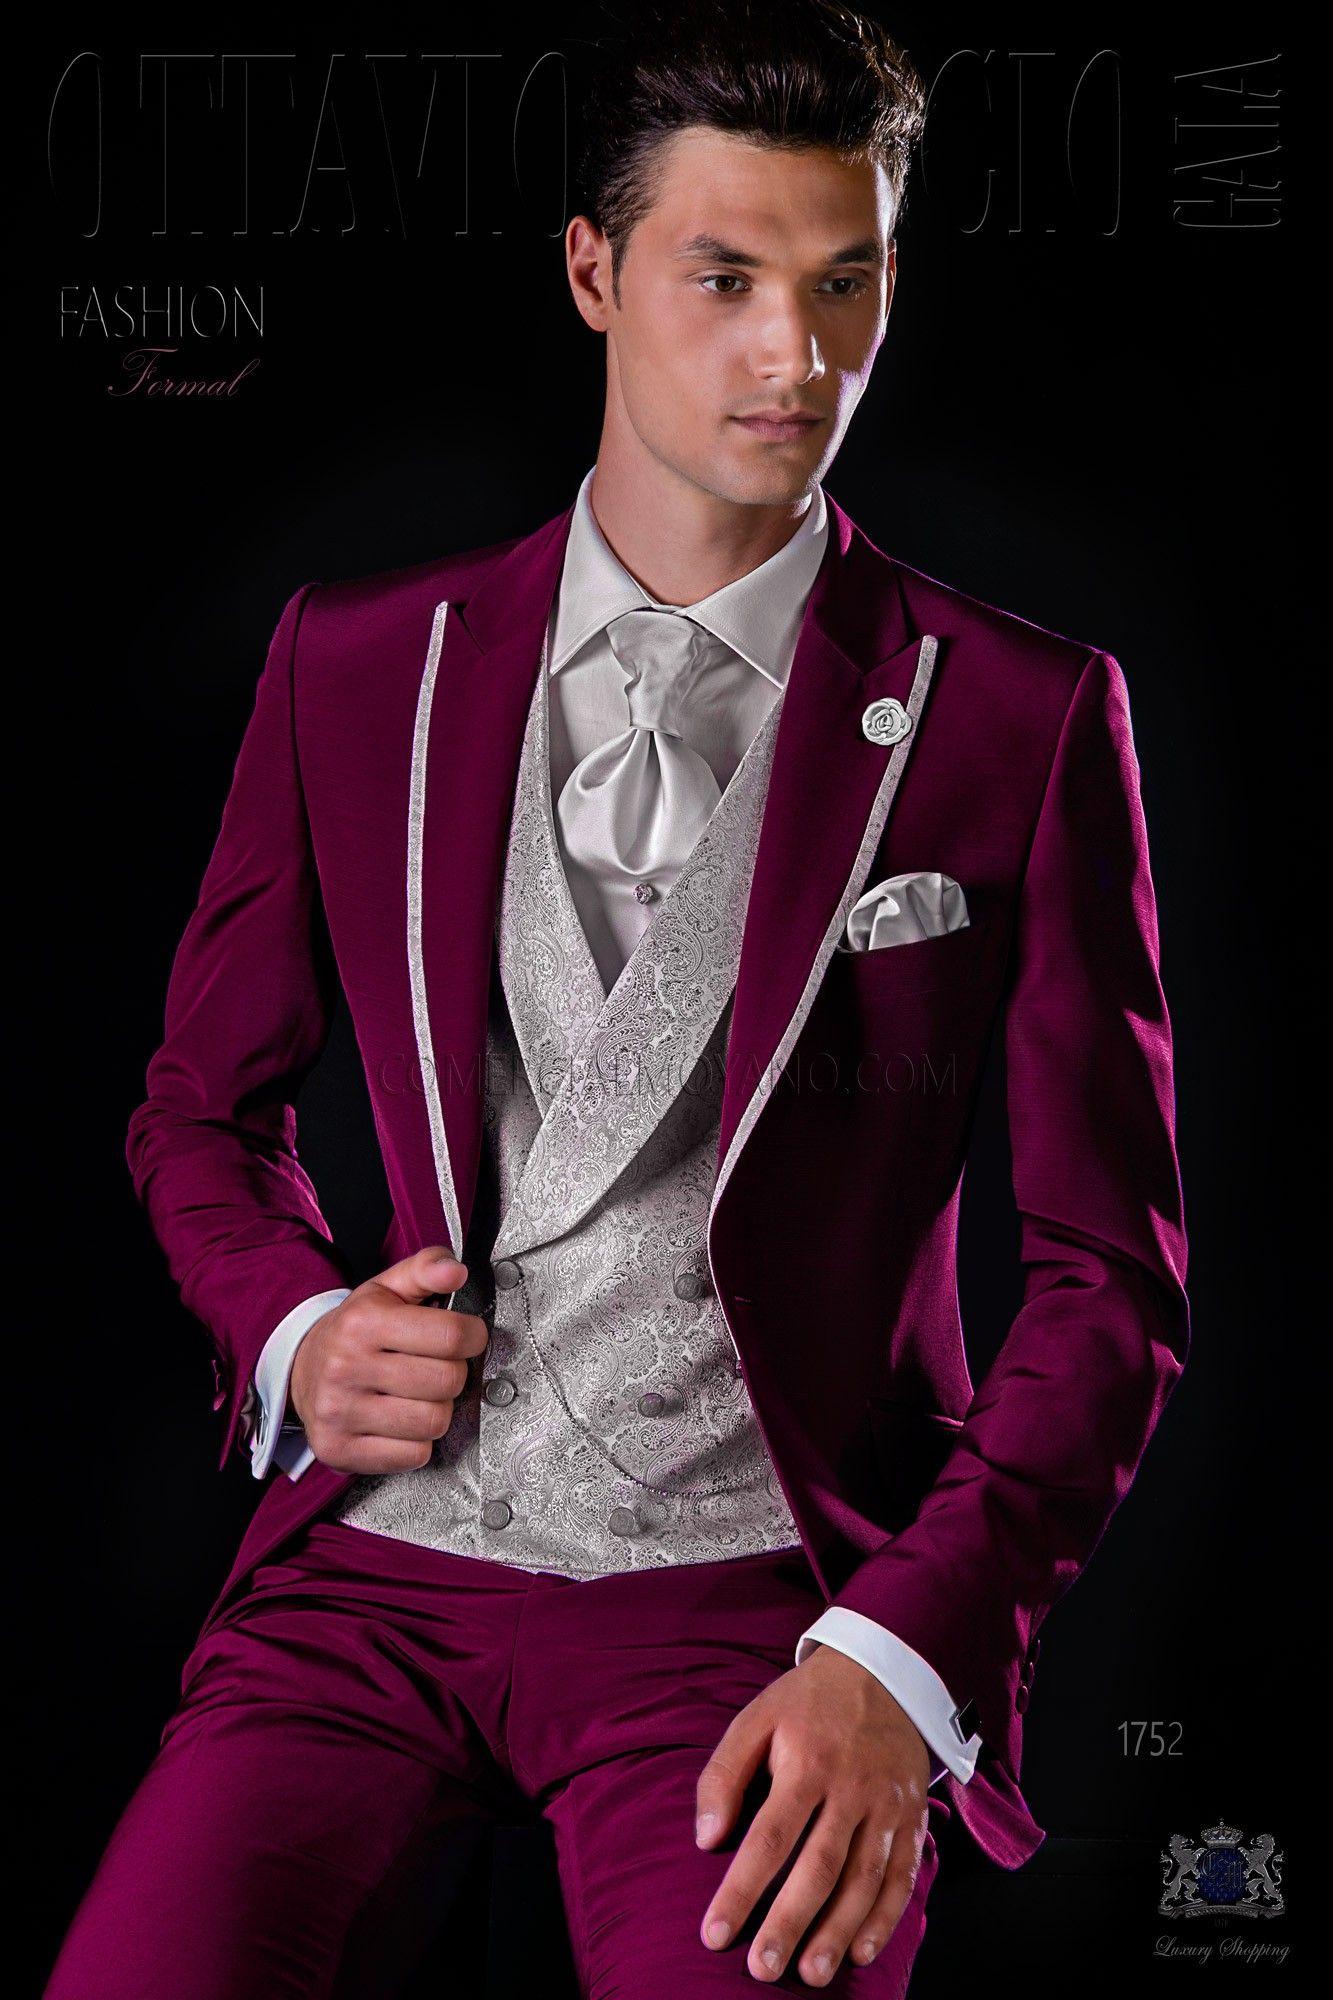 burgunde br utigam anzug mit perlgrau kontrast perlgrau br utigam anz ge und hochzeitsanzug. Black Bedroom Furniture Sets. Home Design Ideas